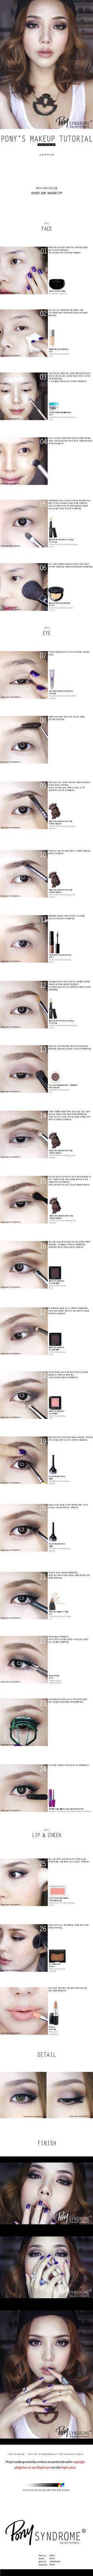 No.42 Hazy Air Makeup